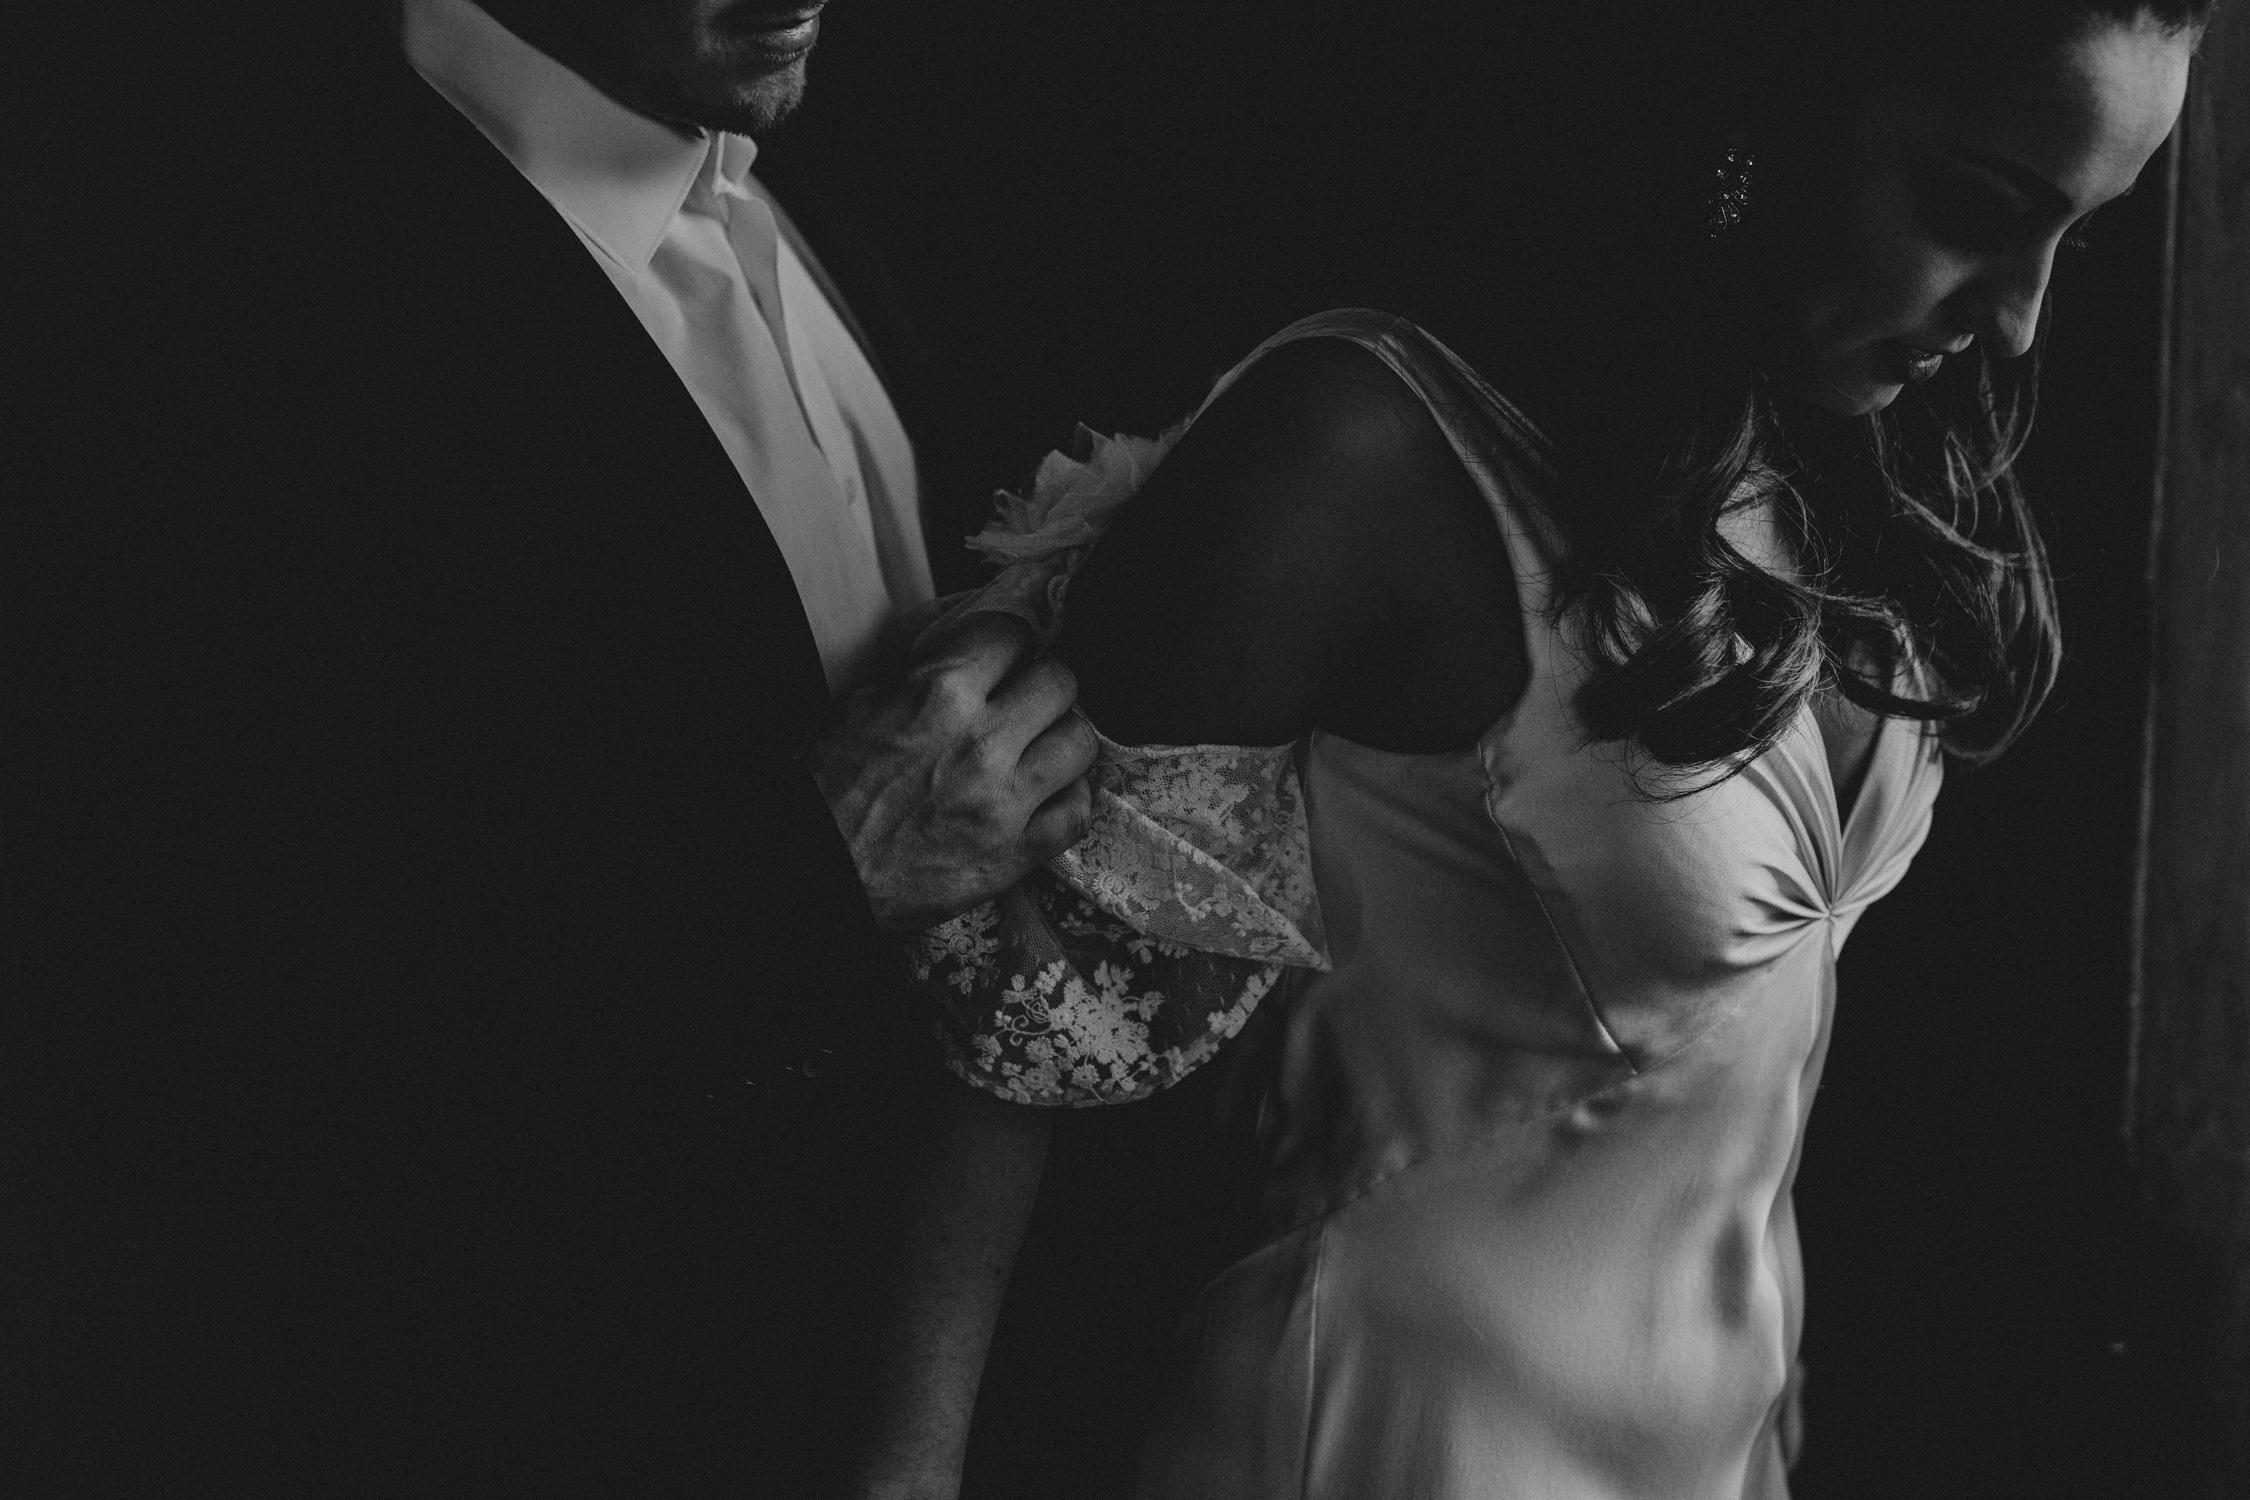 albany_wedding_boudoir_012.JPG